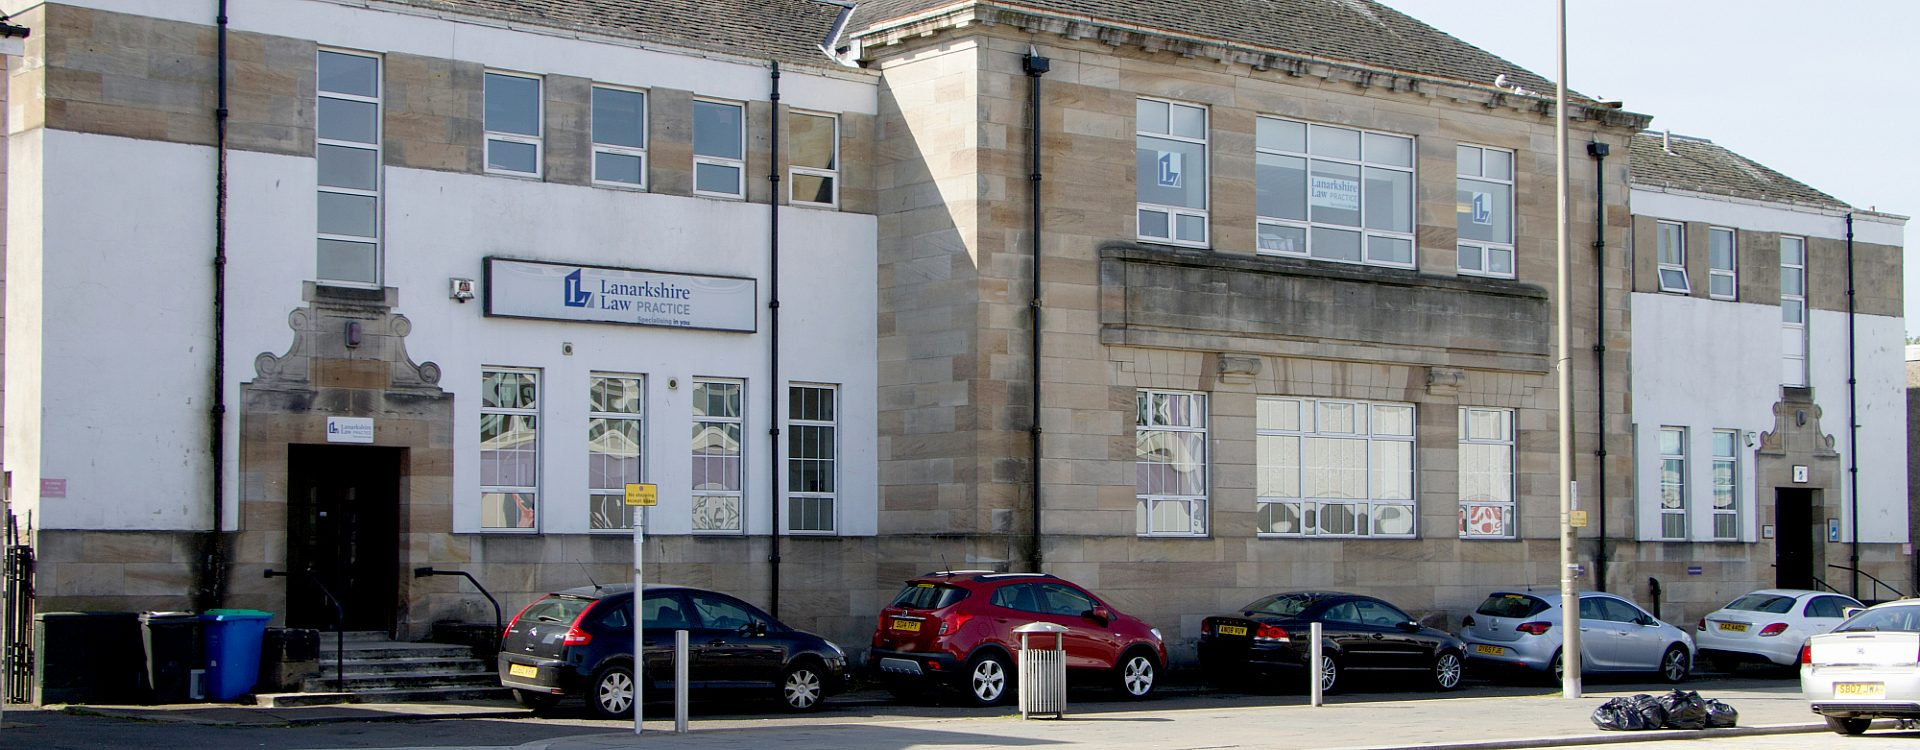 Lanarkshire Law Practice